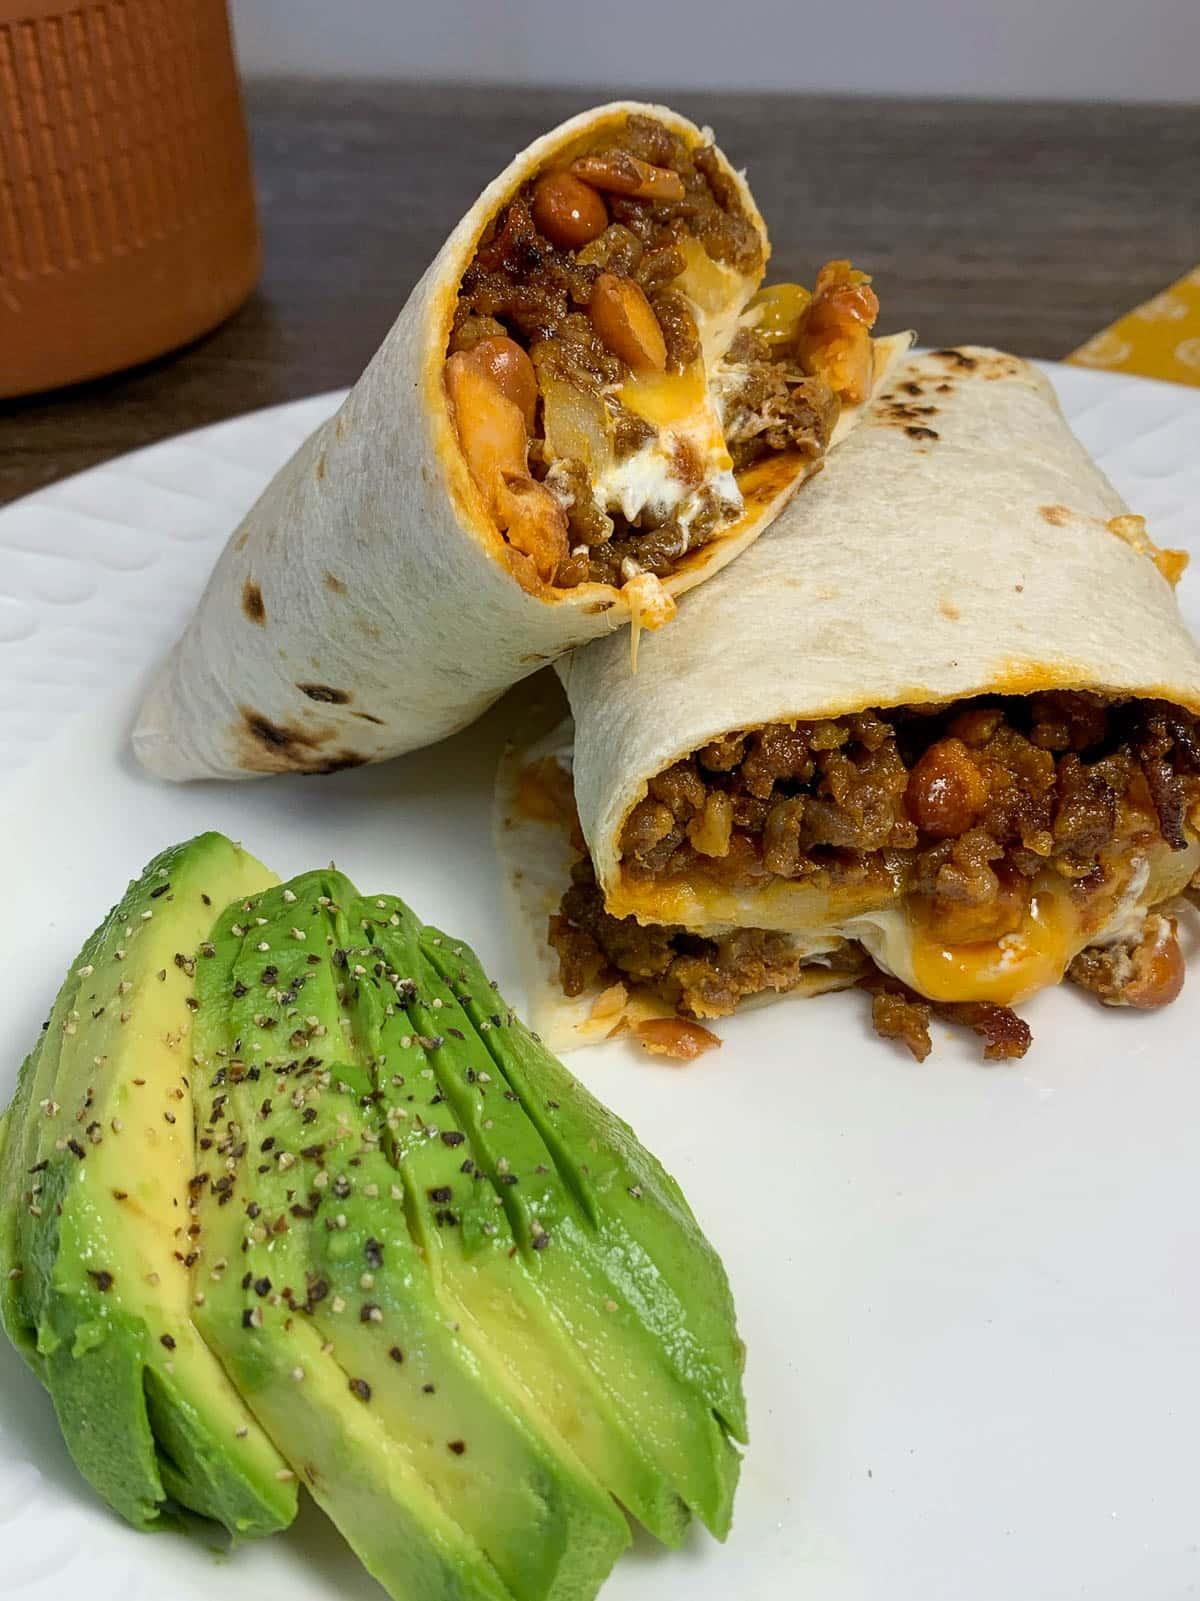 burrito with avocados